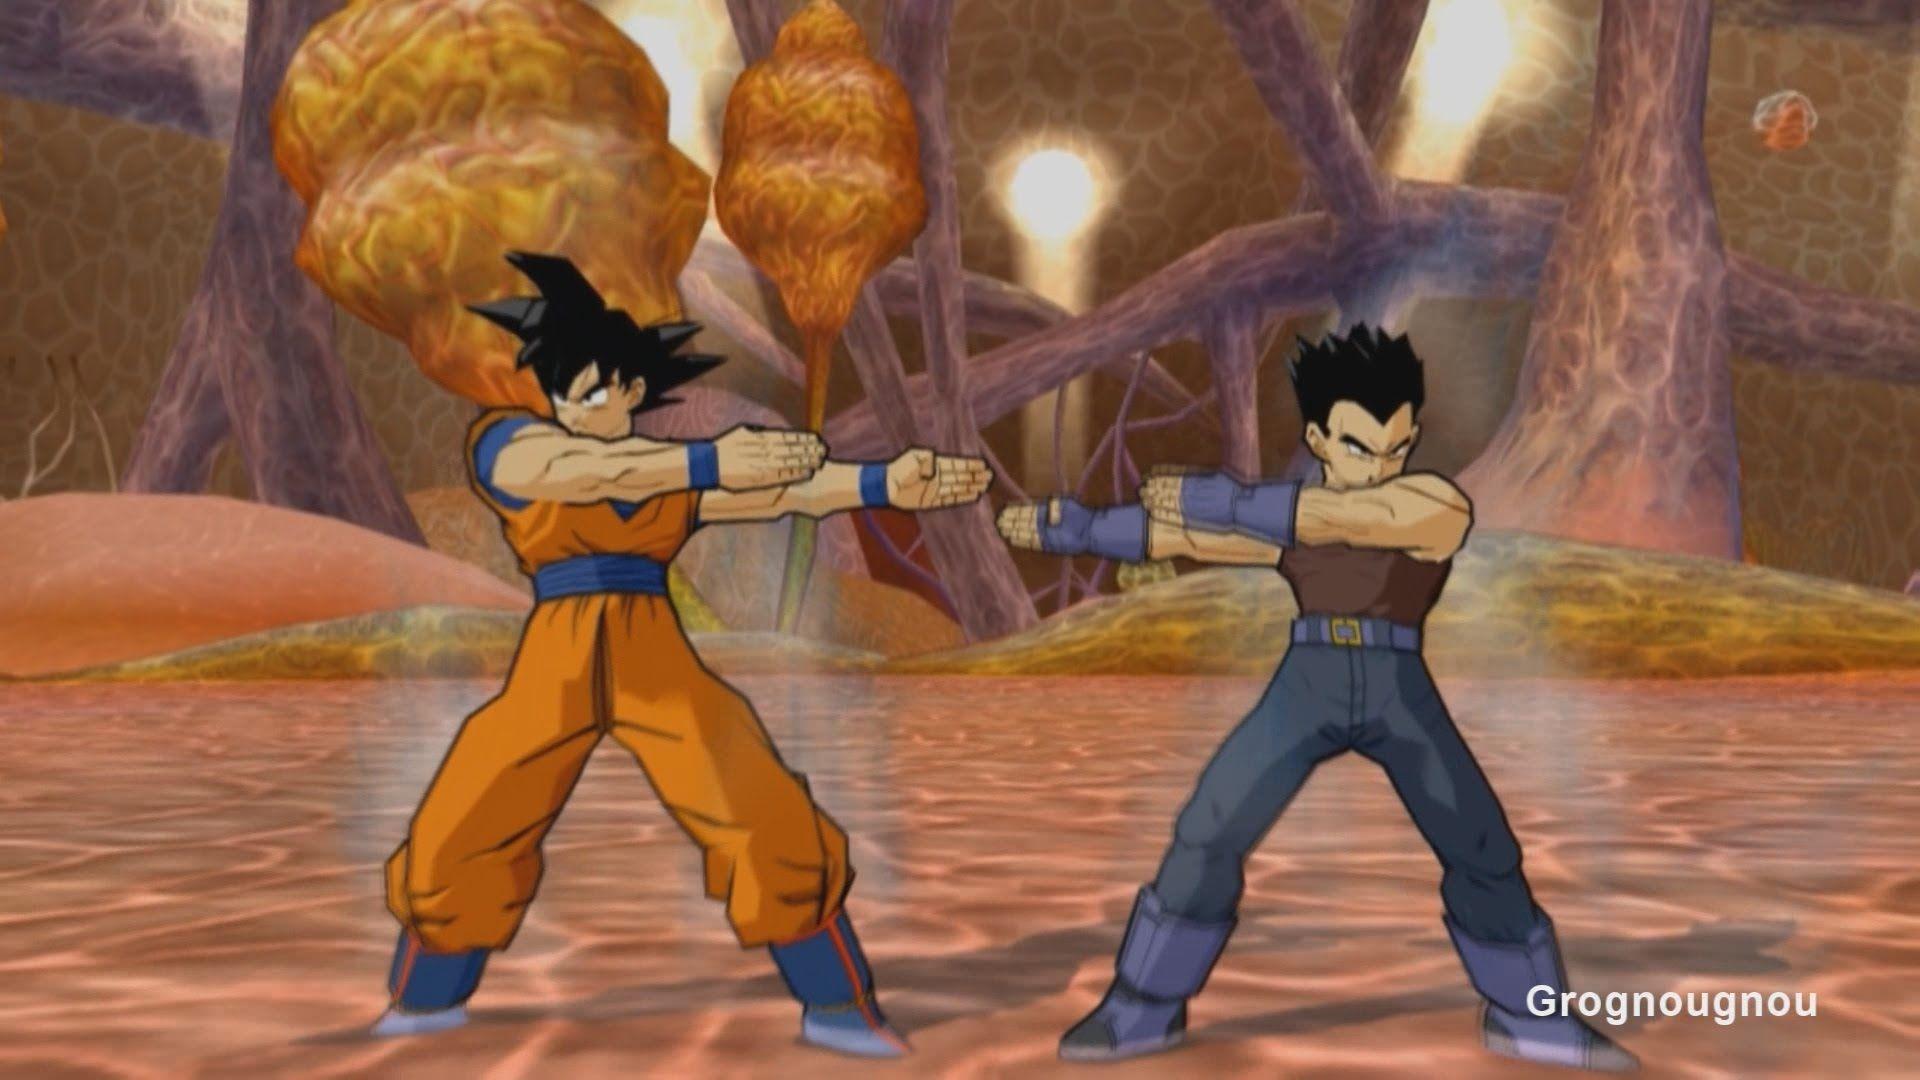 Vegeta GT and Goku fusion dance Mod inside Buu in Dragon